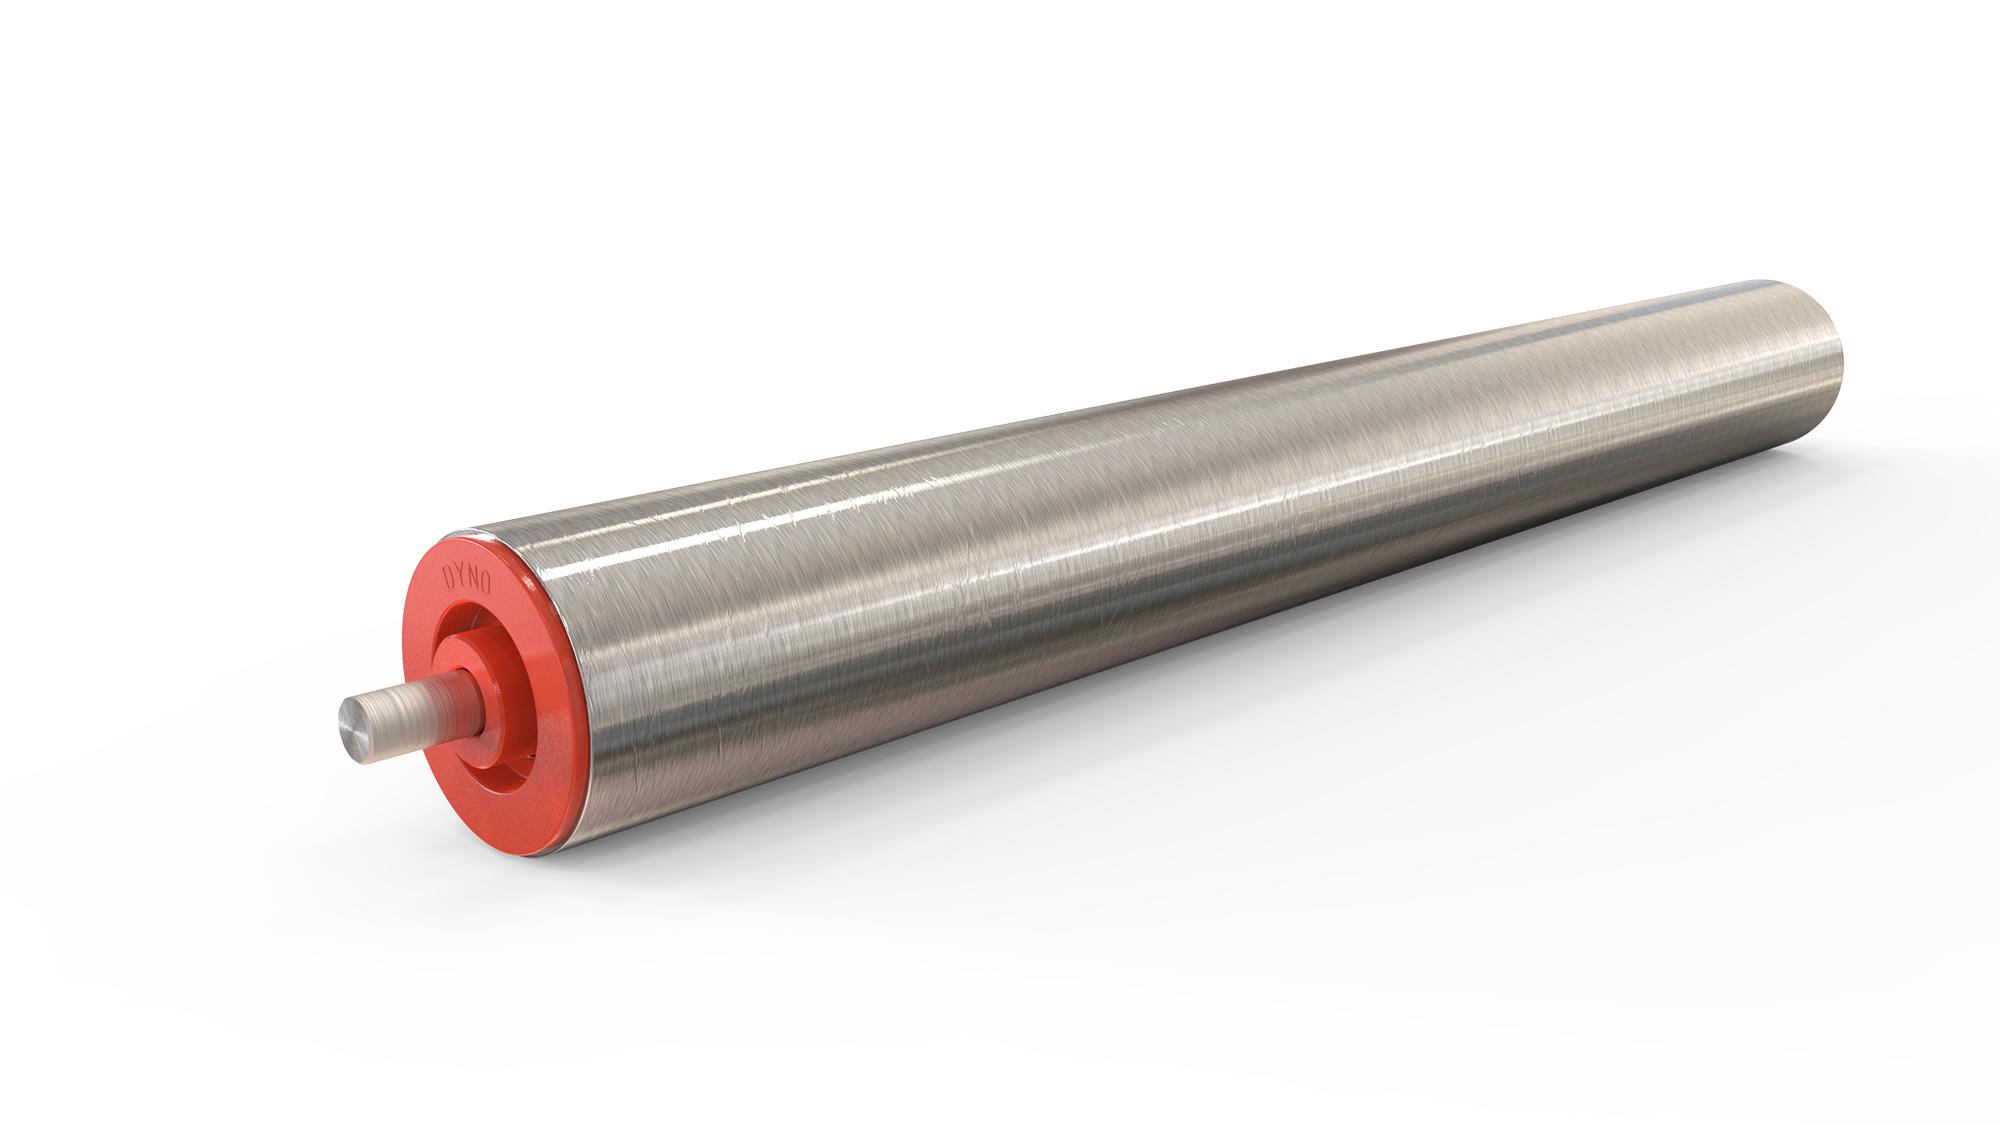 512 Stainless Steel Roller Dyno Conveyors Roller Belt